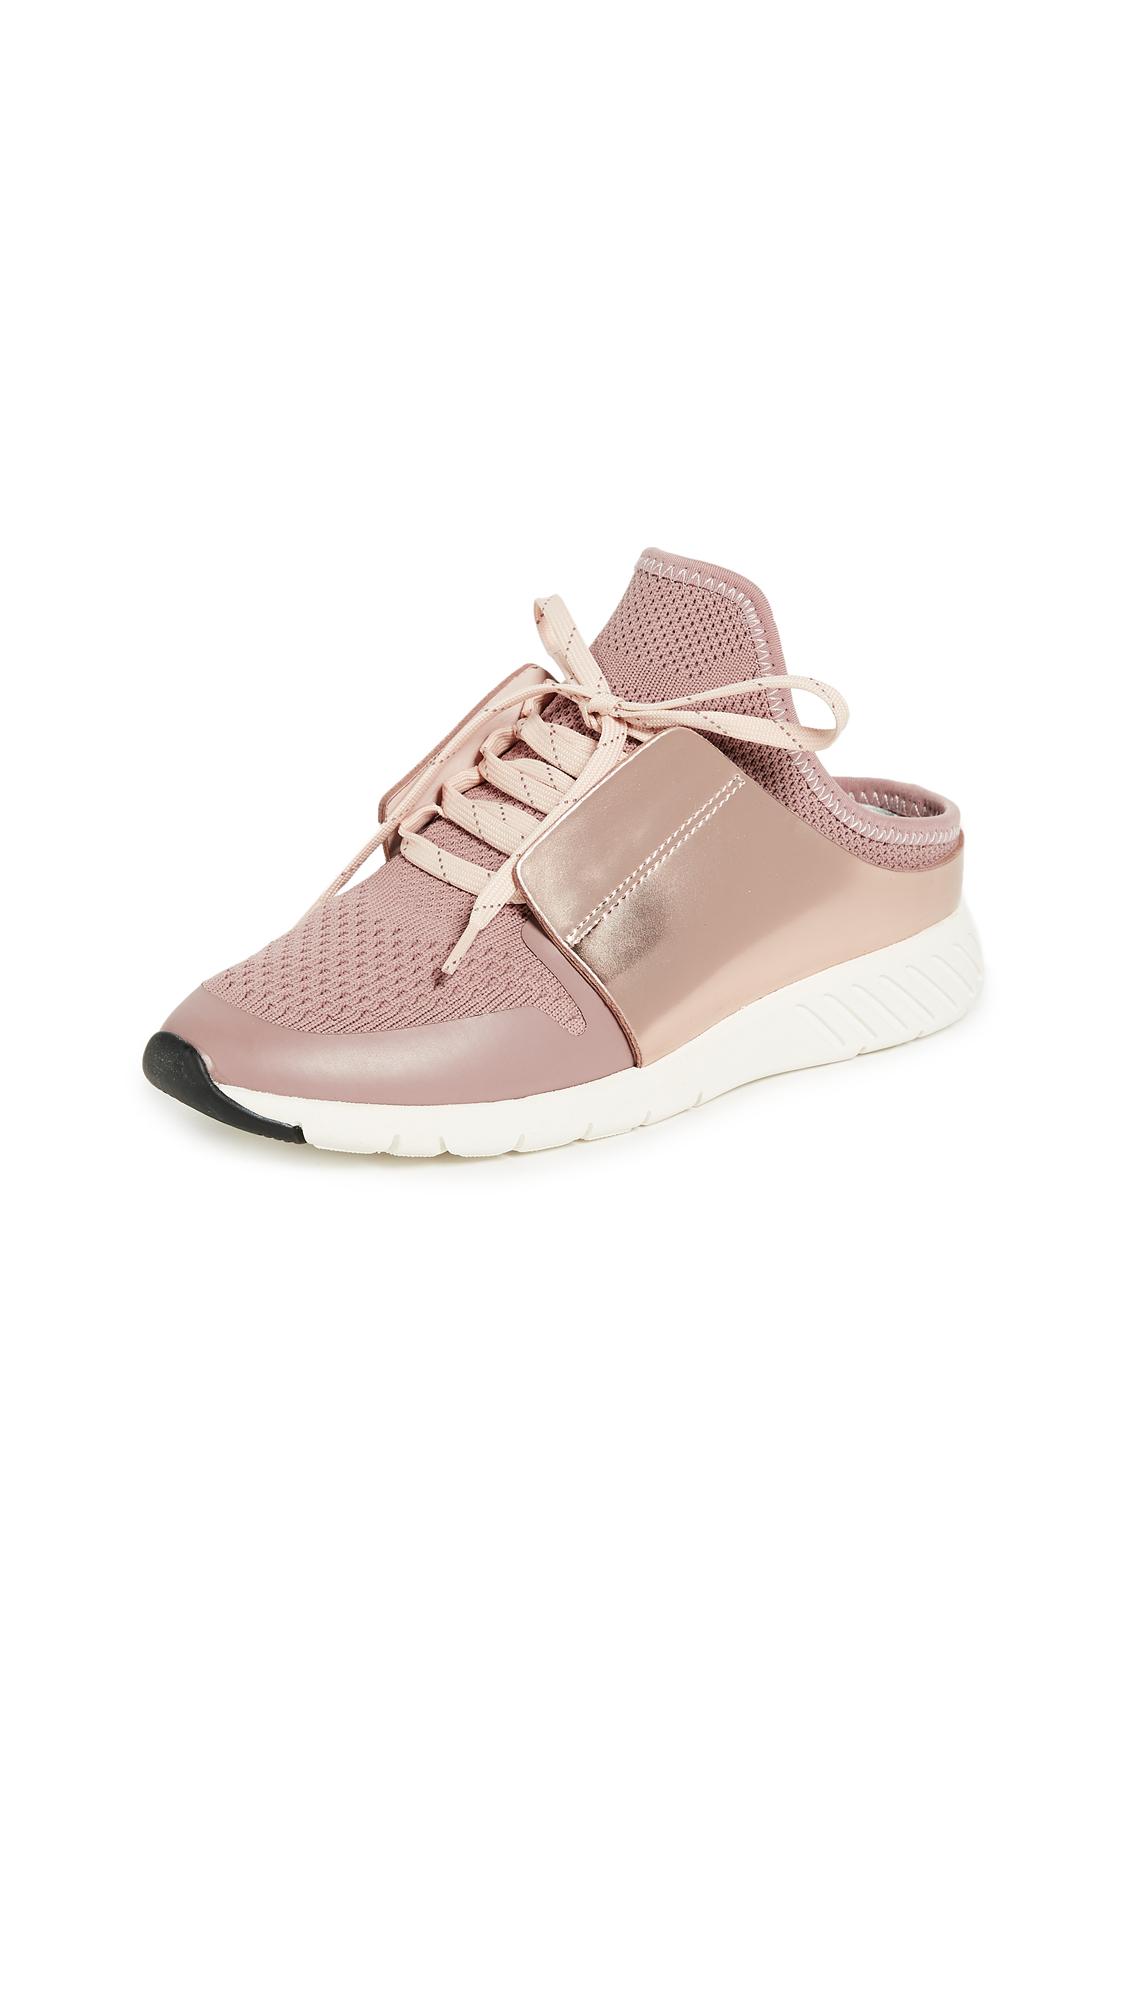 Dolce Vita Braun Mule Sneakers - Rose Gold